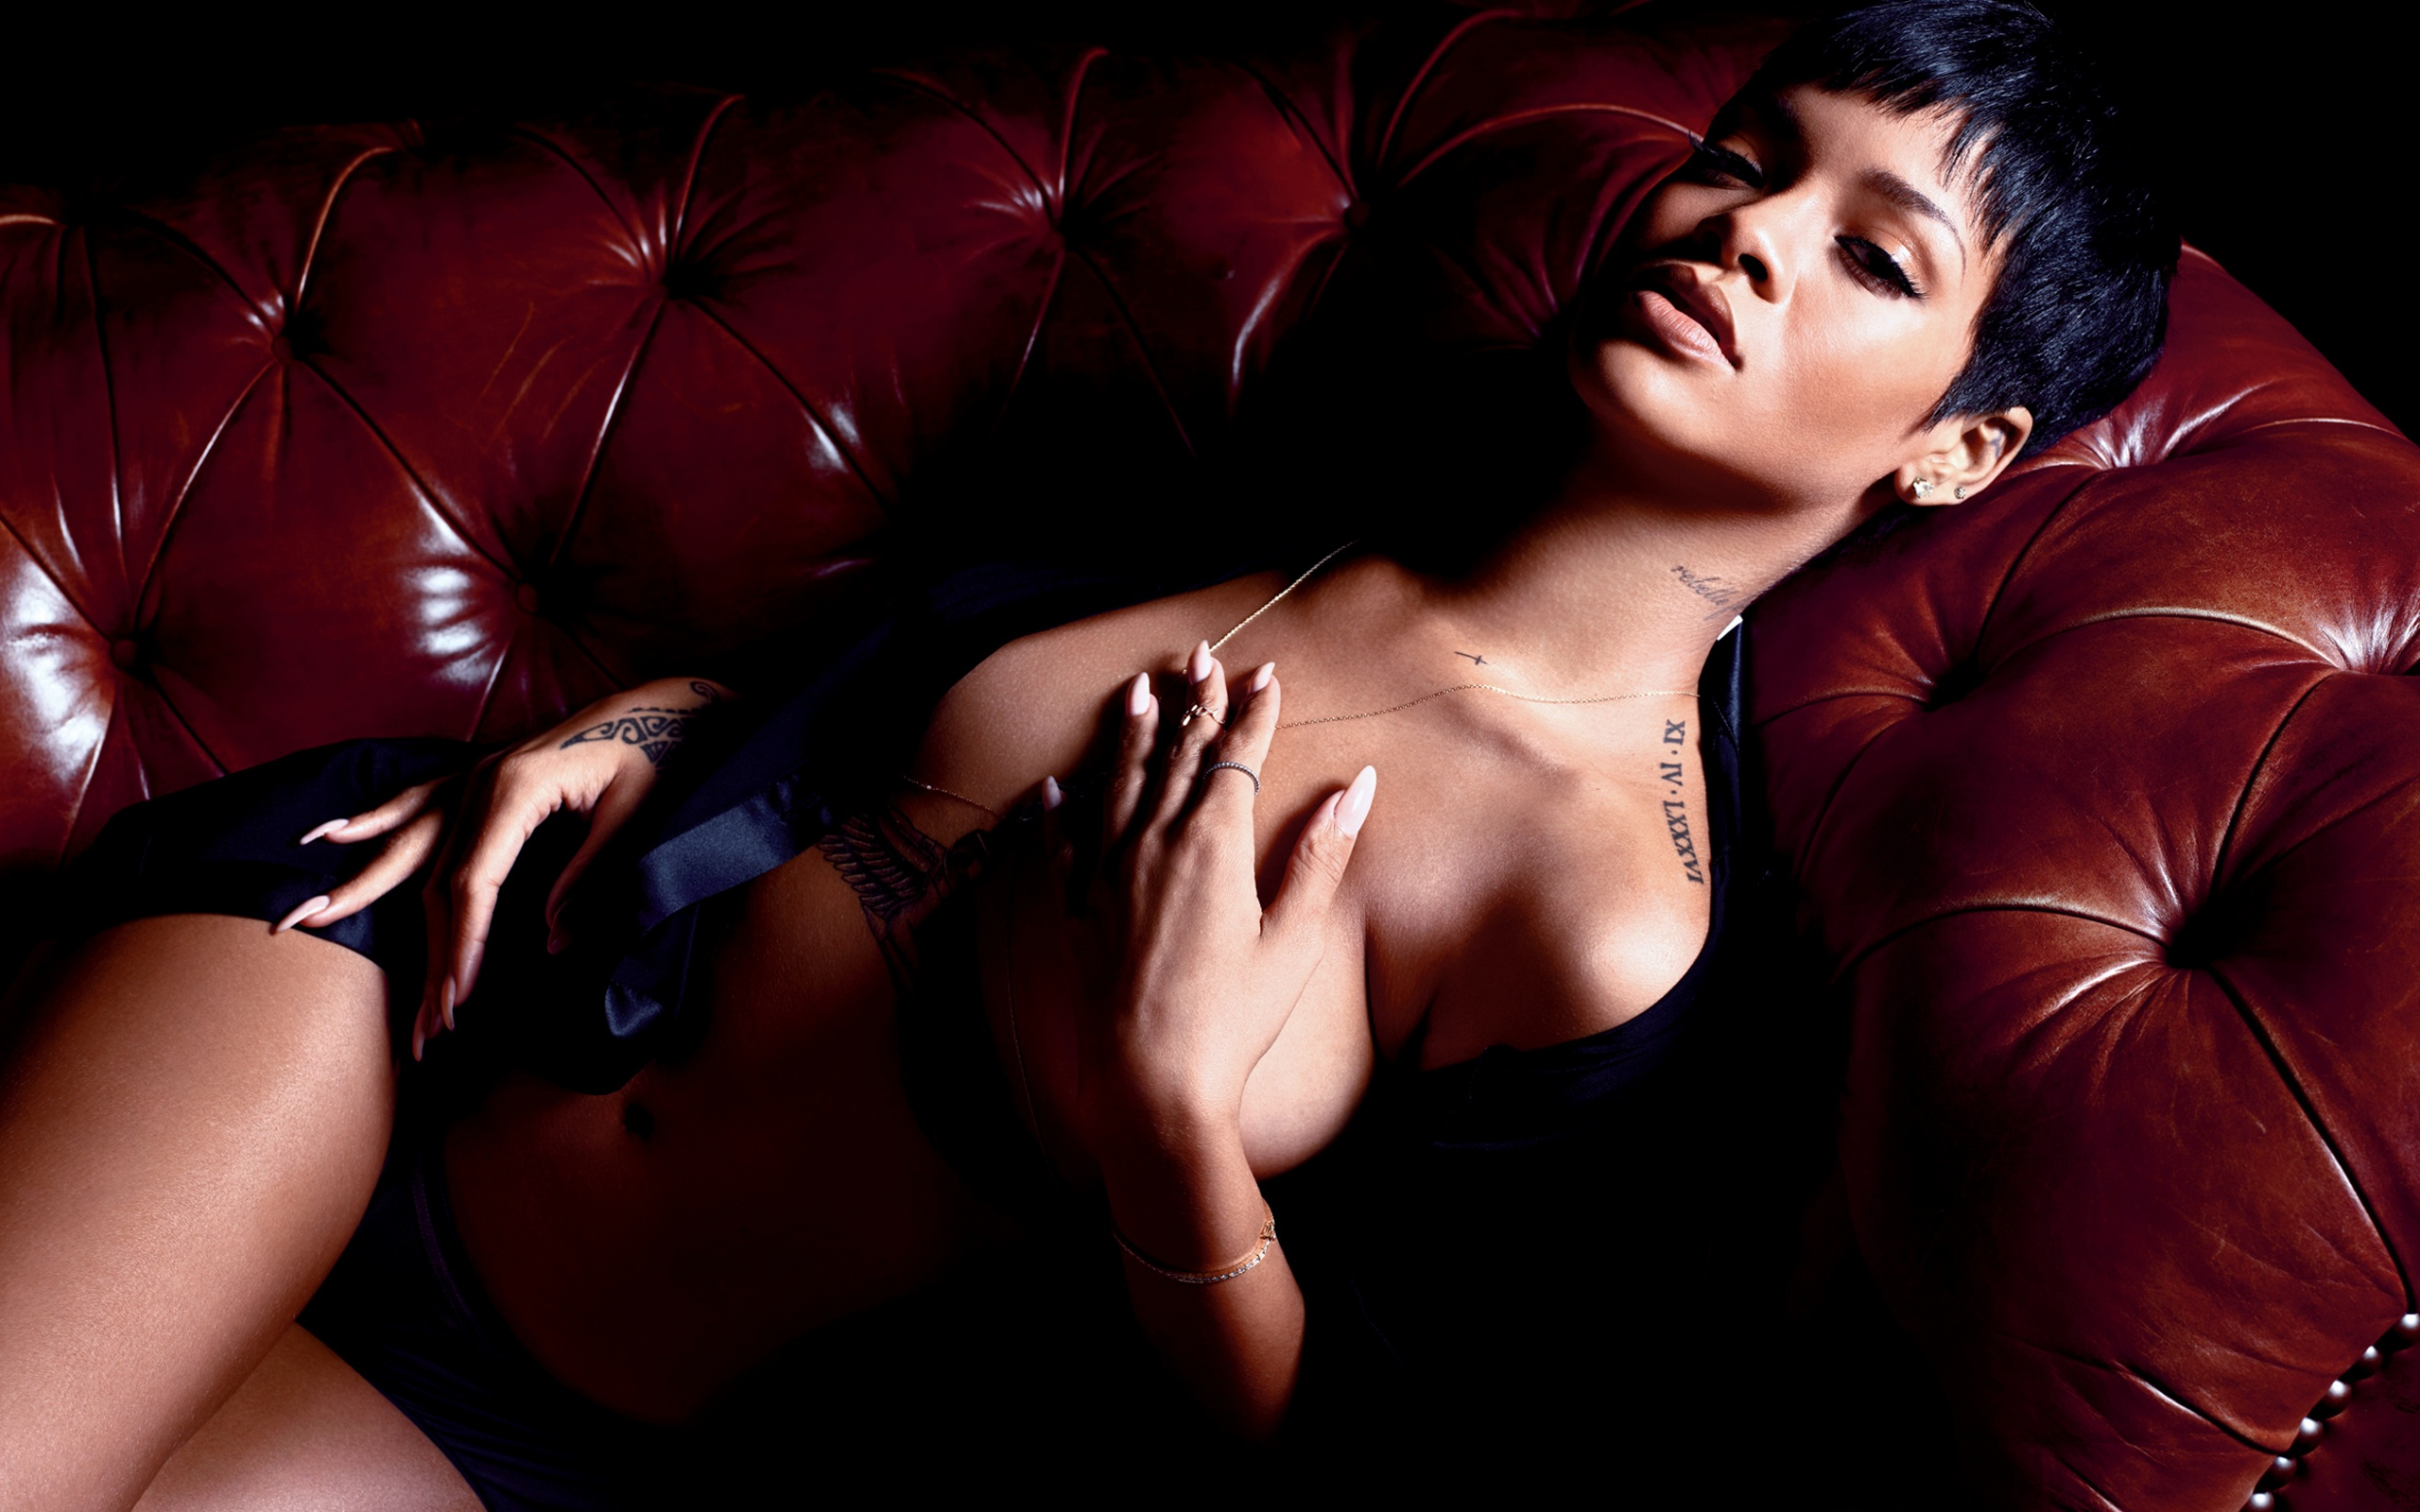 People 2560x1600 Rihanna singer tattoo couch strategic covering nude women celebrity women indoors short hair dark hair indoors inked girls